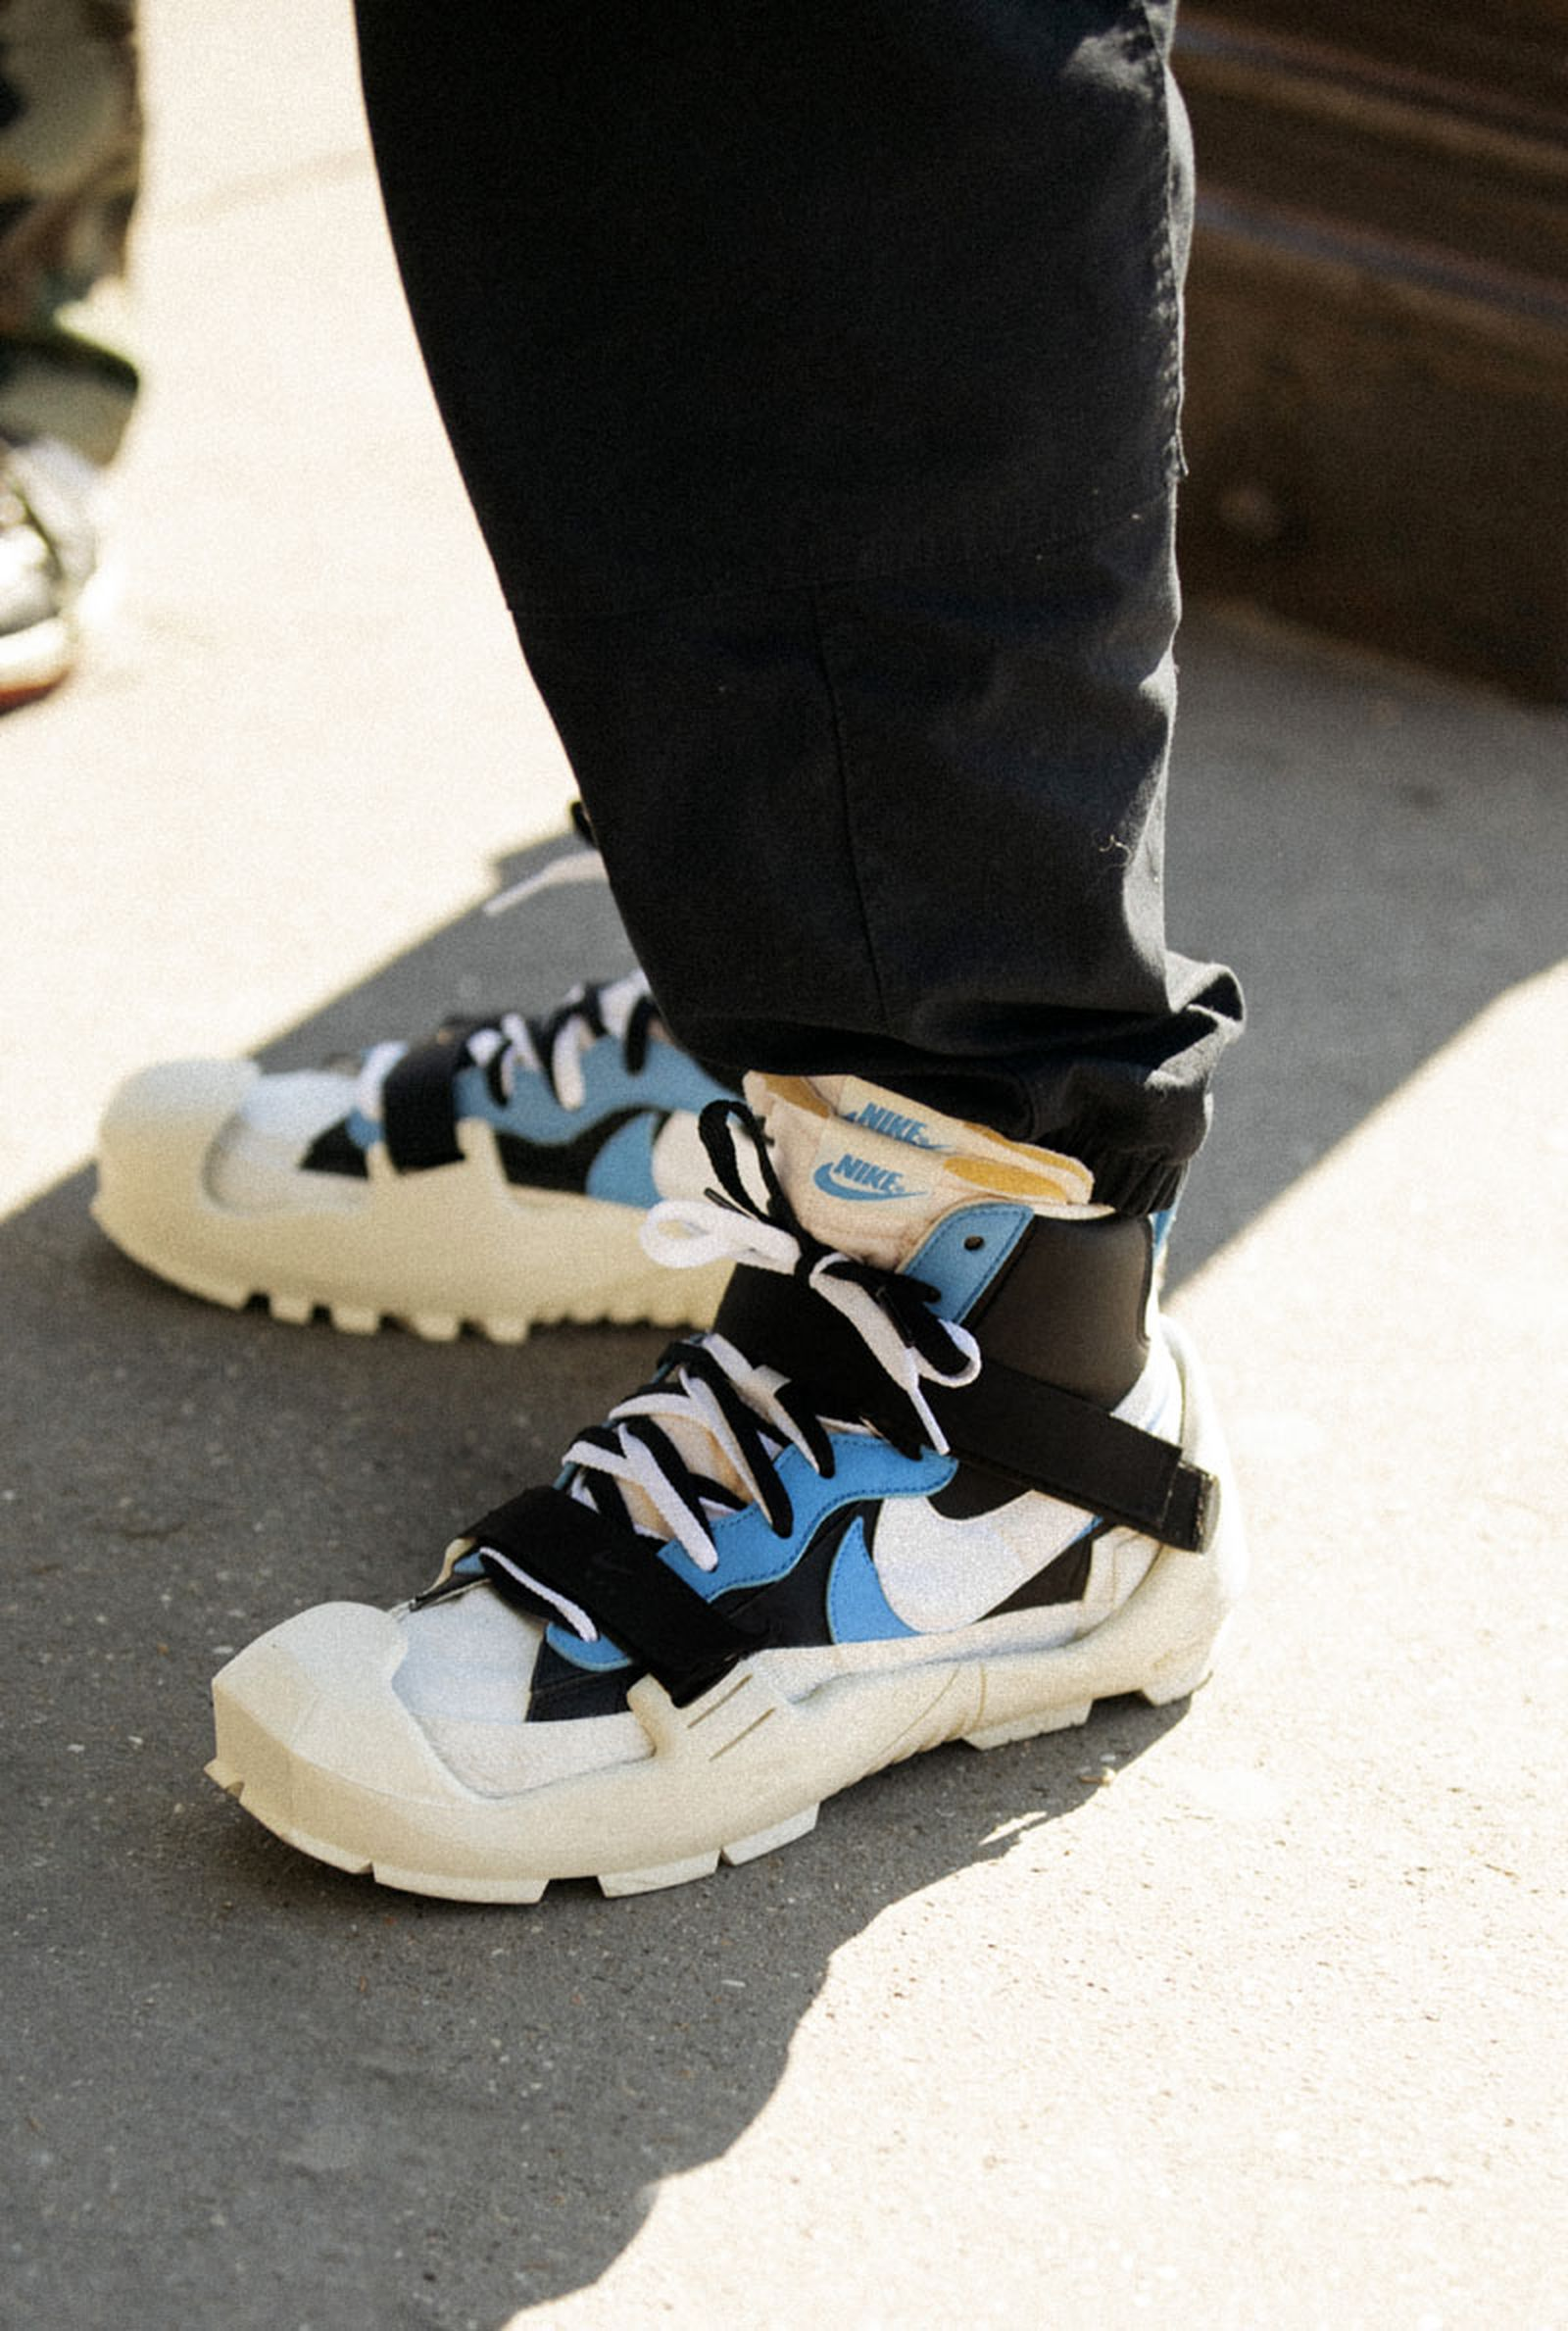 paris fashion week ss20 sneakers 012 Nike comme des garcons li ning